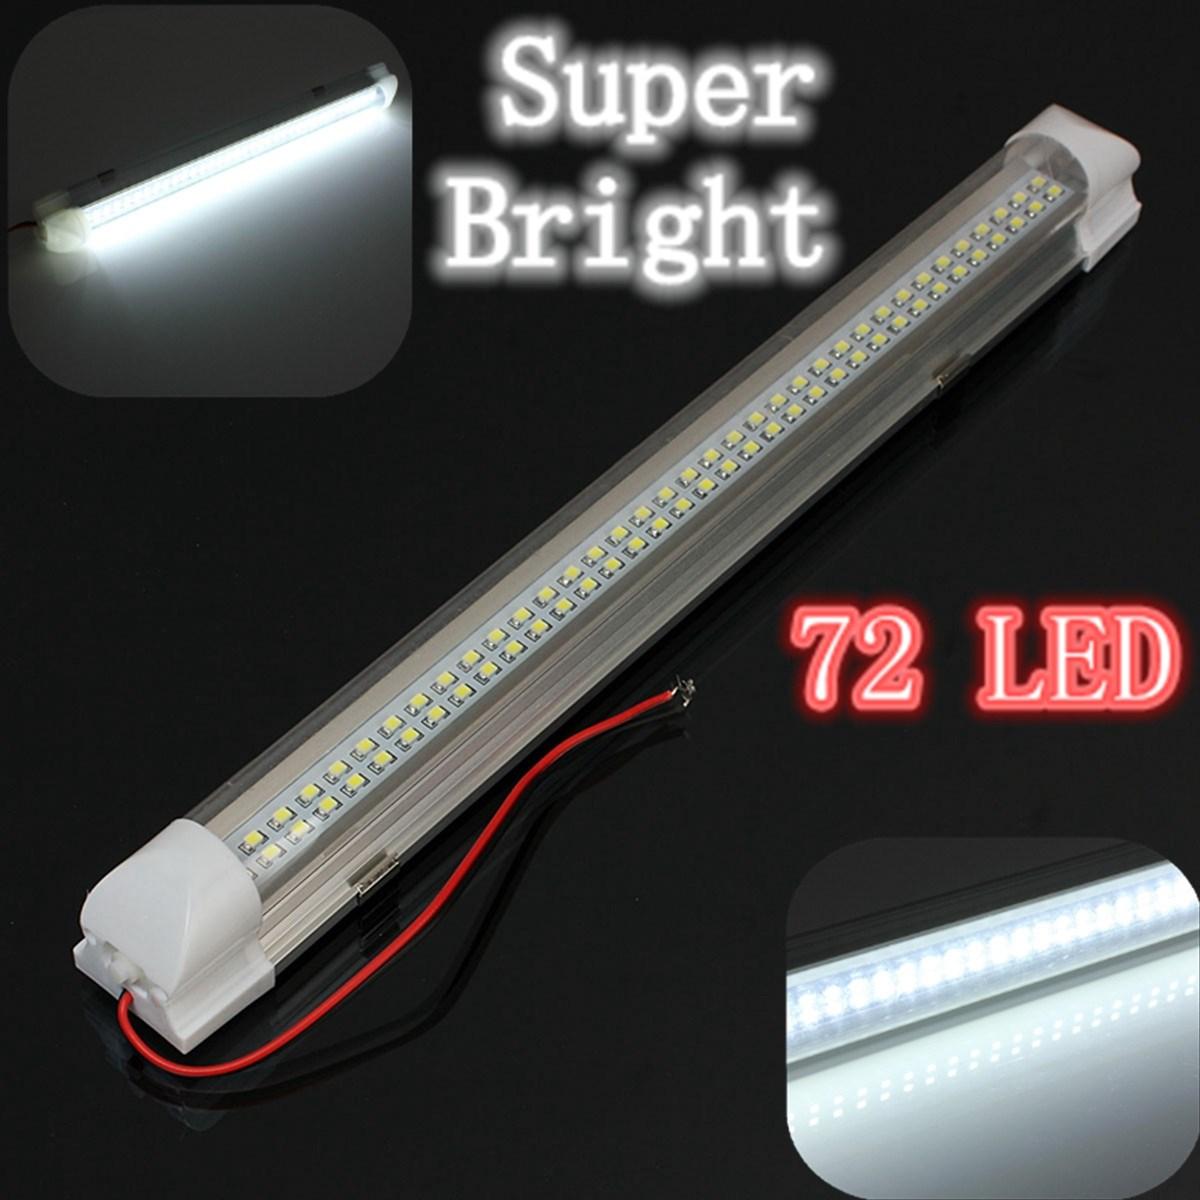 12v universal car auto caravan interior 72 led white light strip bar 340mm lamp on